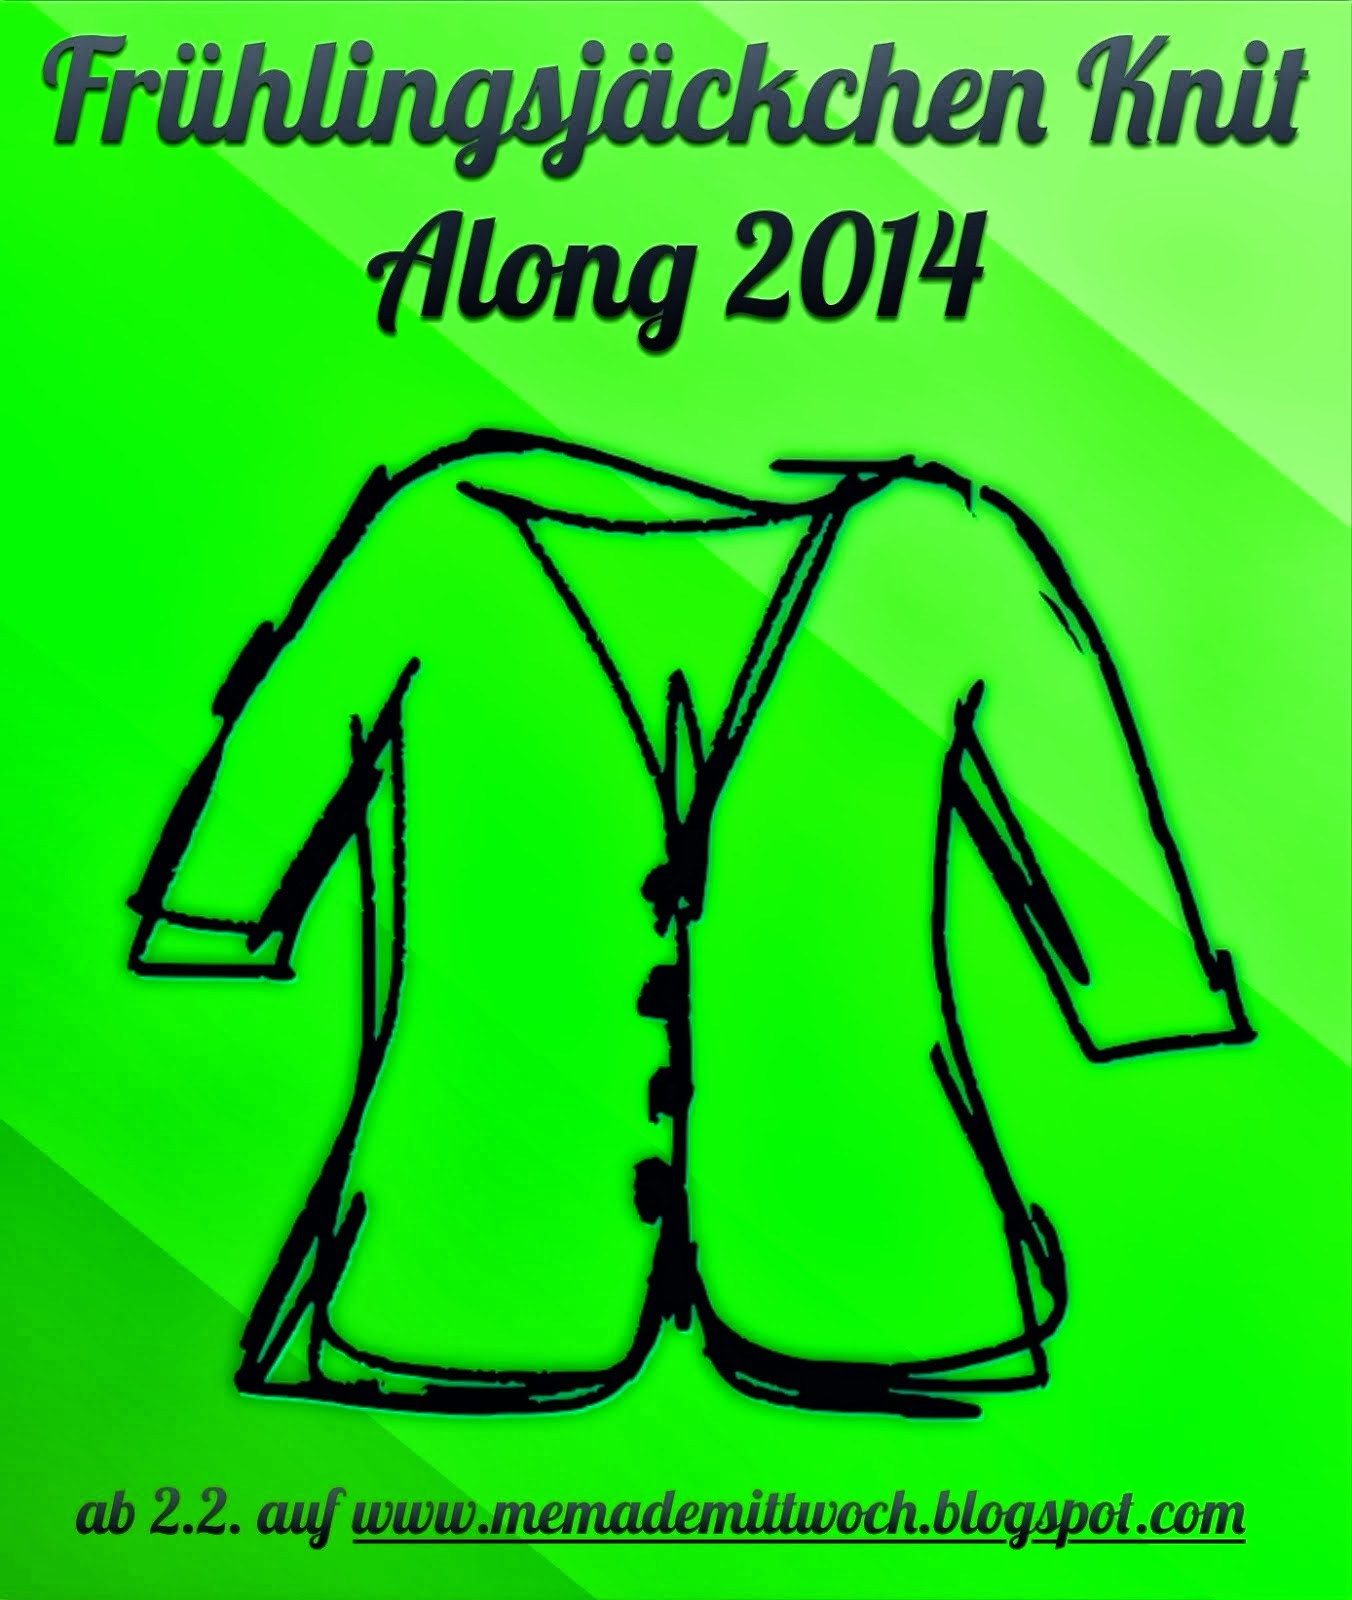 frühlingsjäckchen knitalong 2014